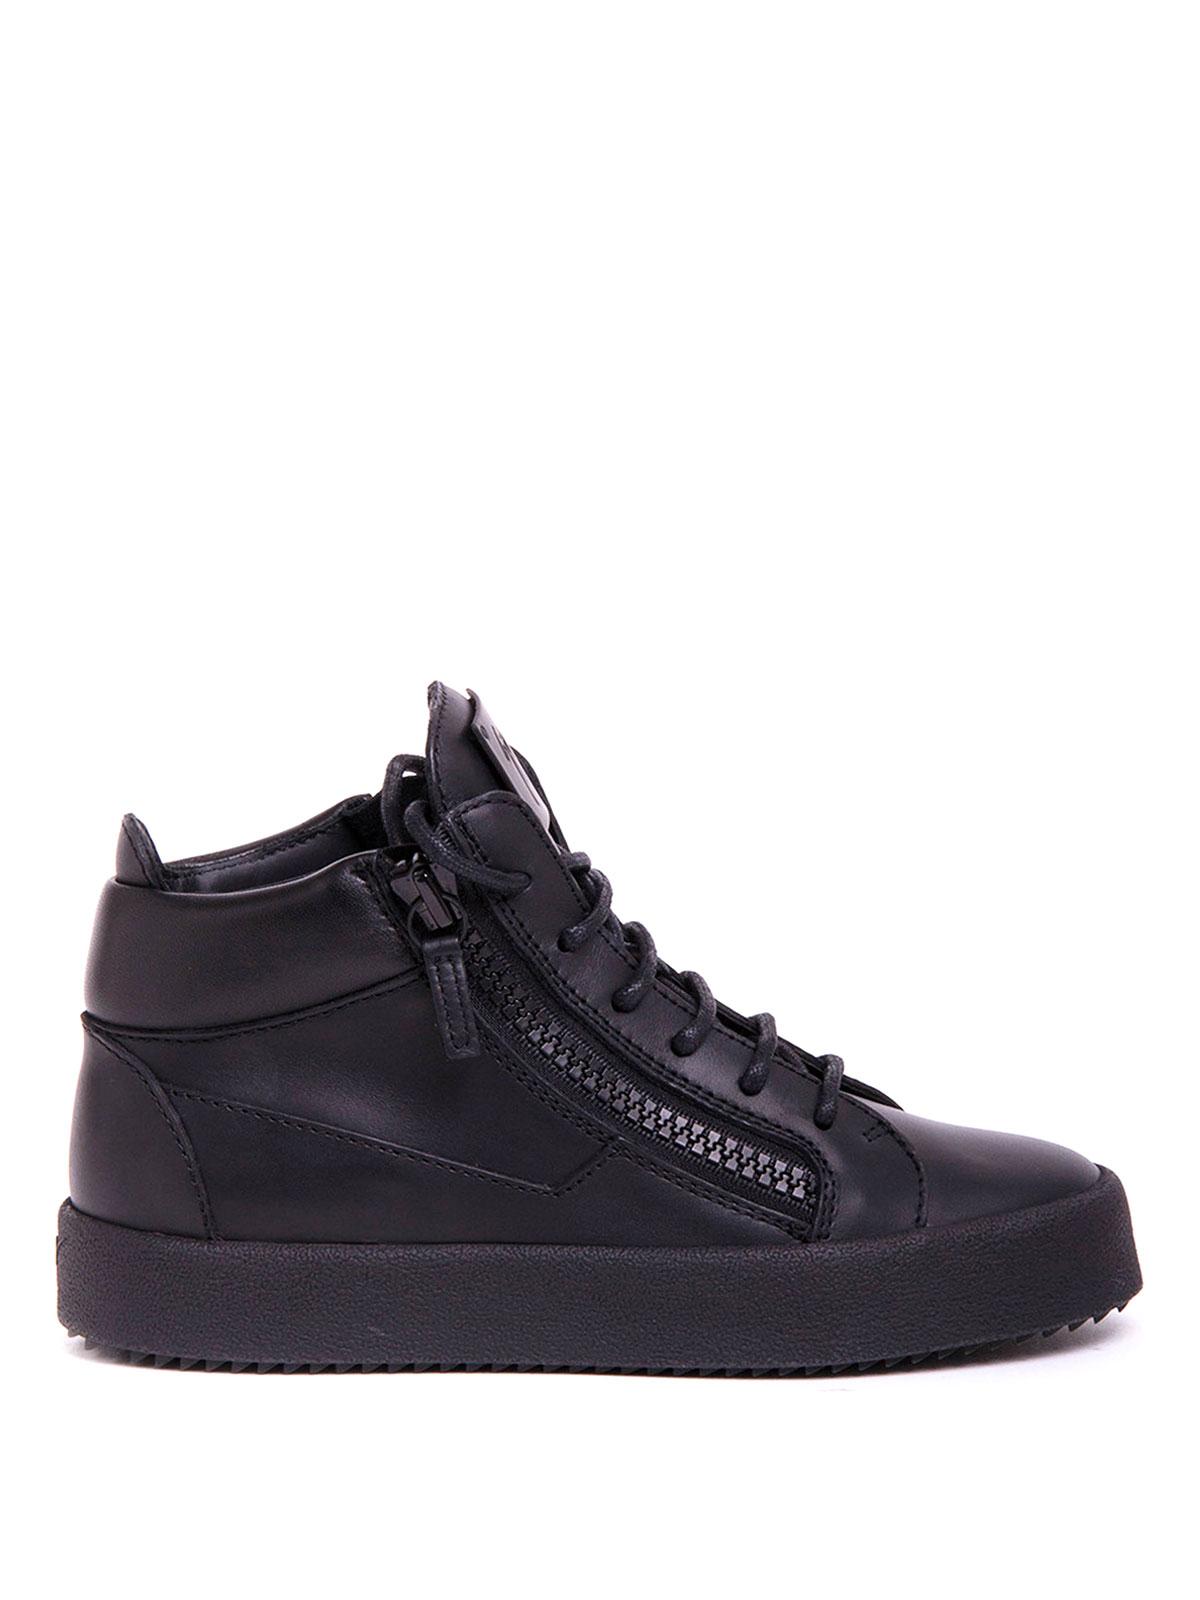 Black Sneaker Wedges Cheap